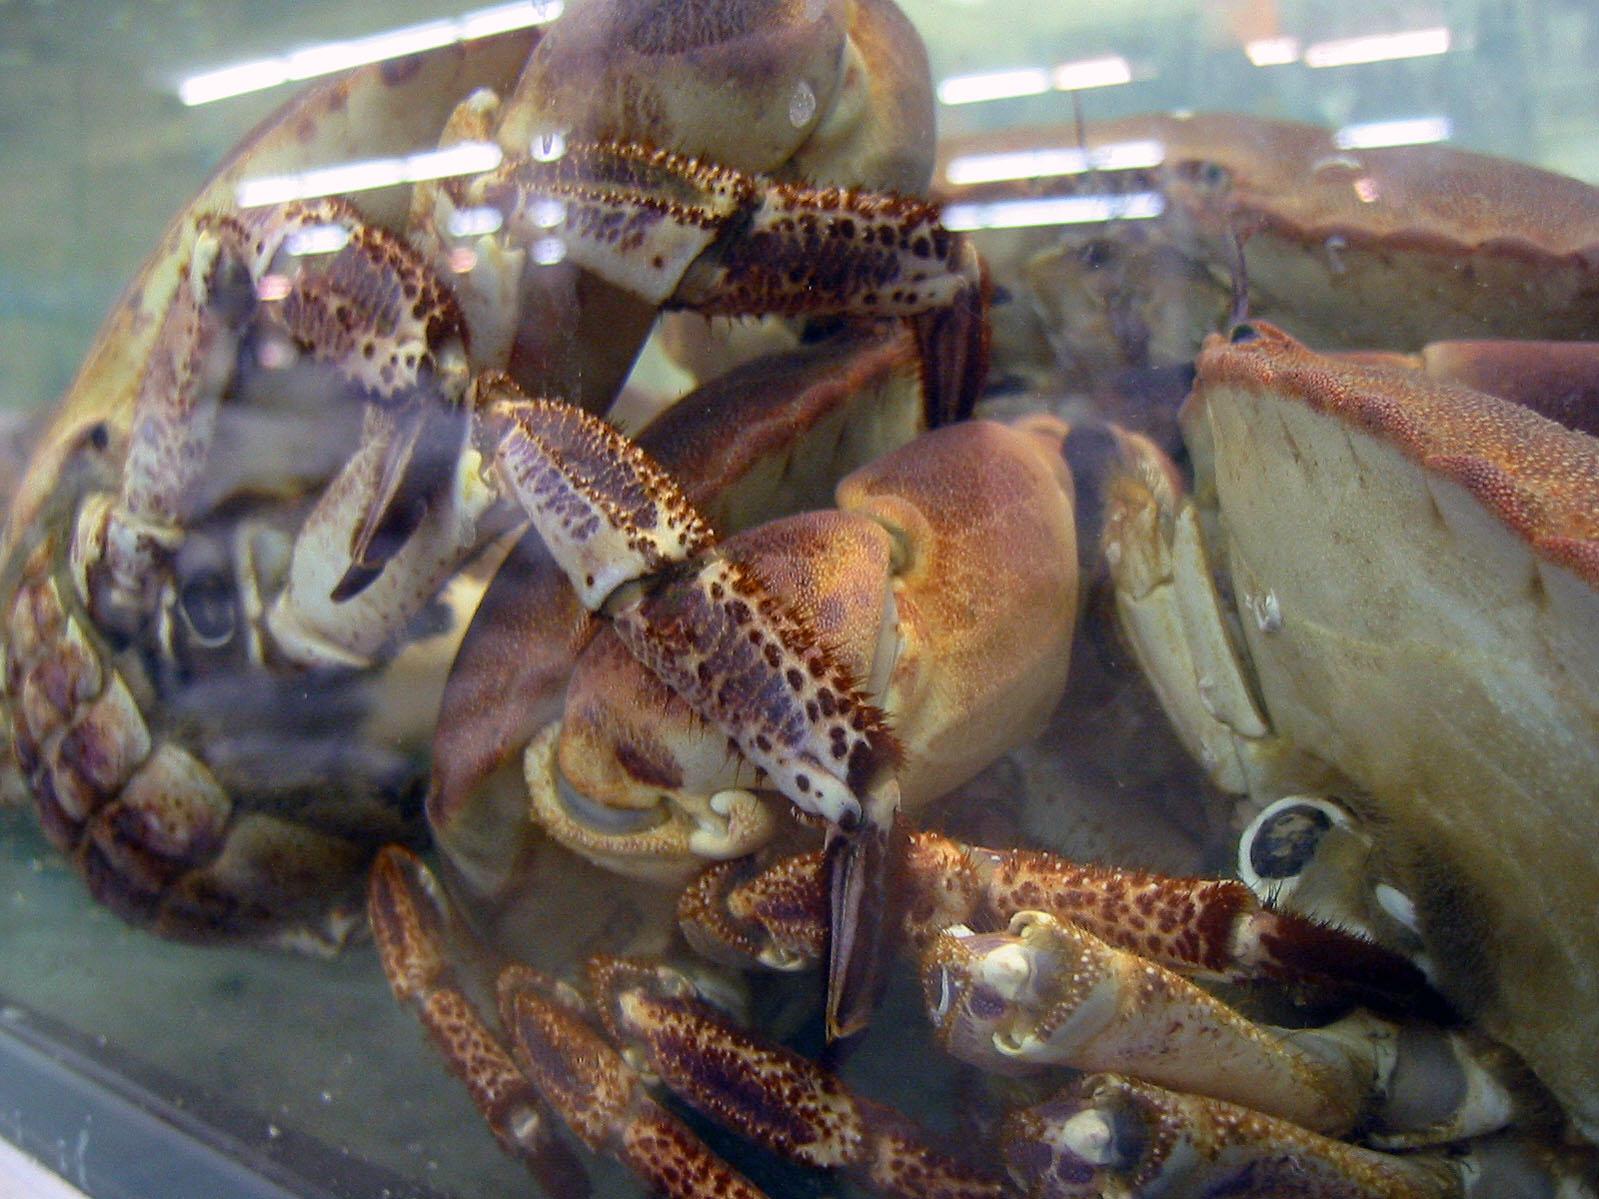 King crabs, Basin, Busy, Close-up, Crab, HQ Photo